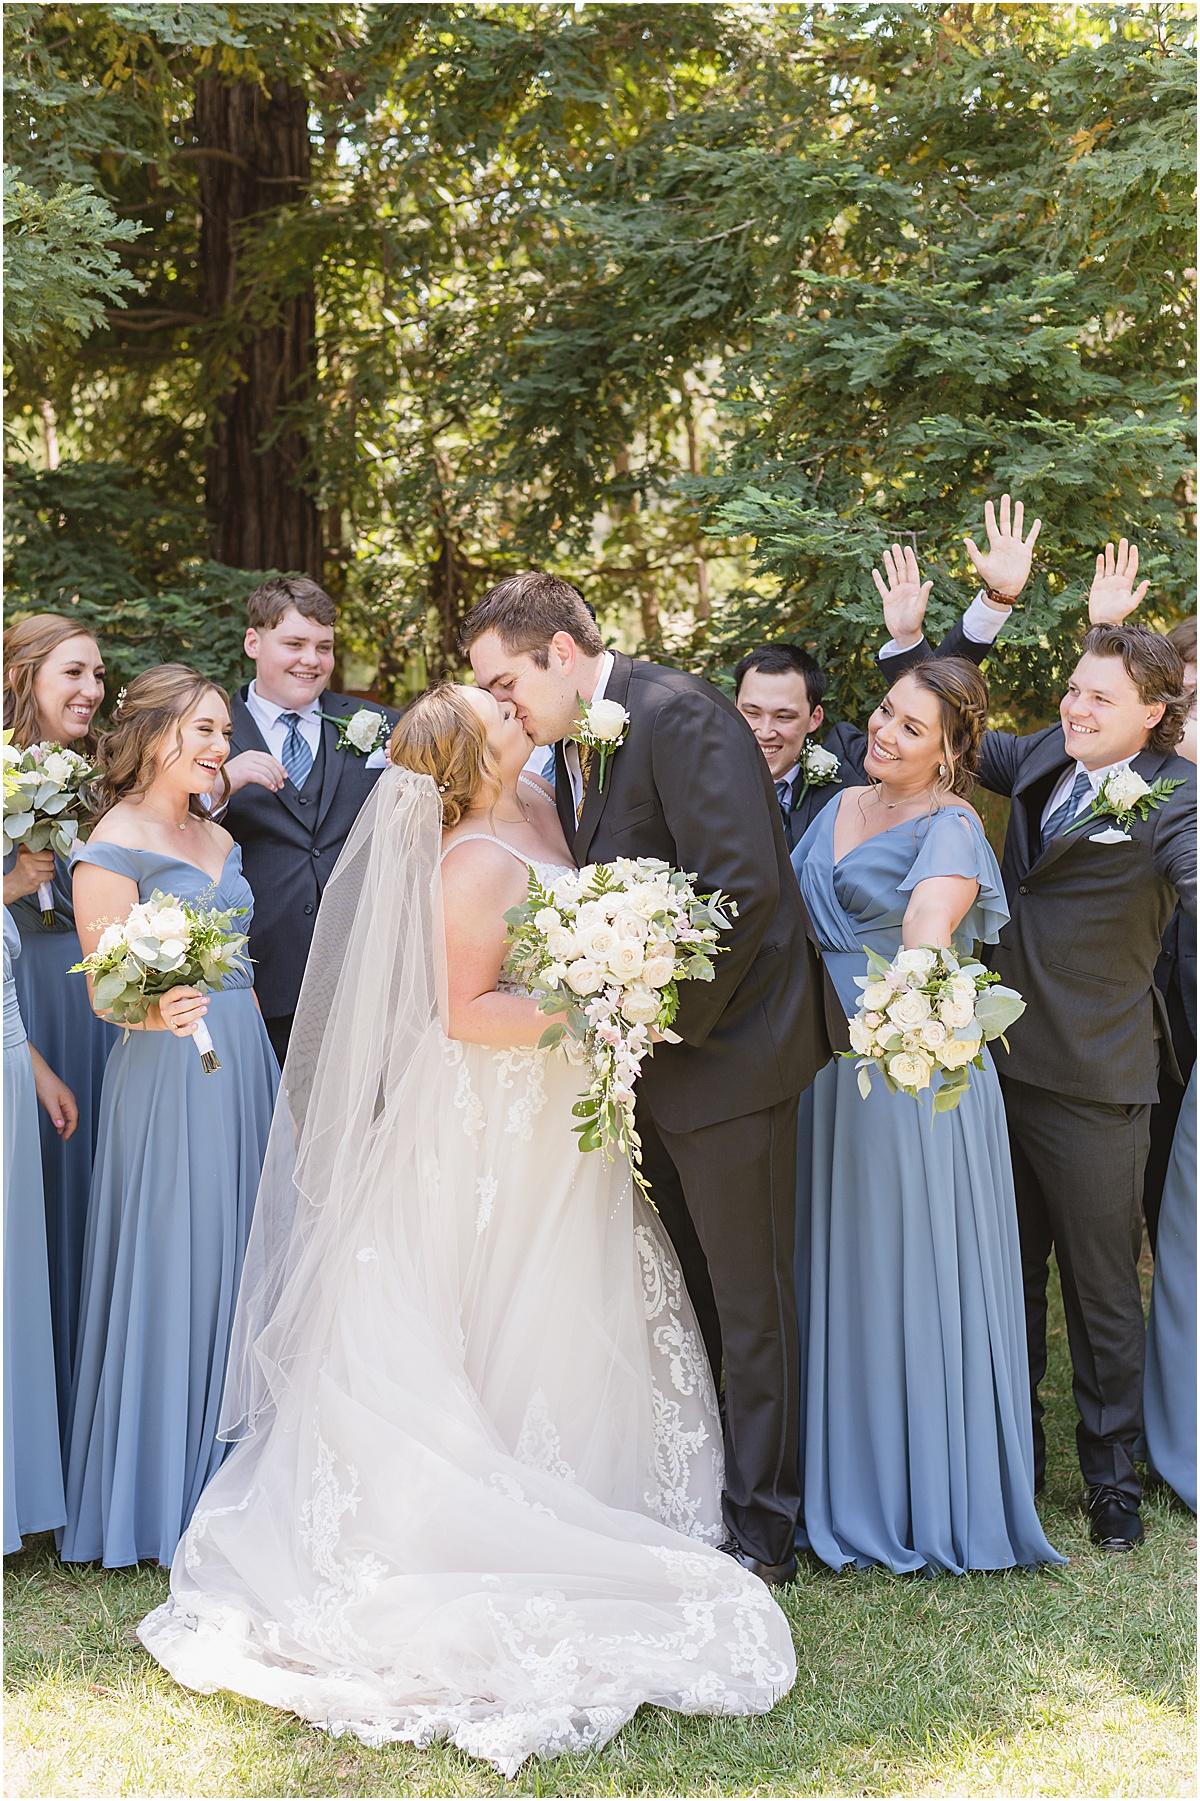 Gilroy wedding at Fortino Winery Ashley and Stephen